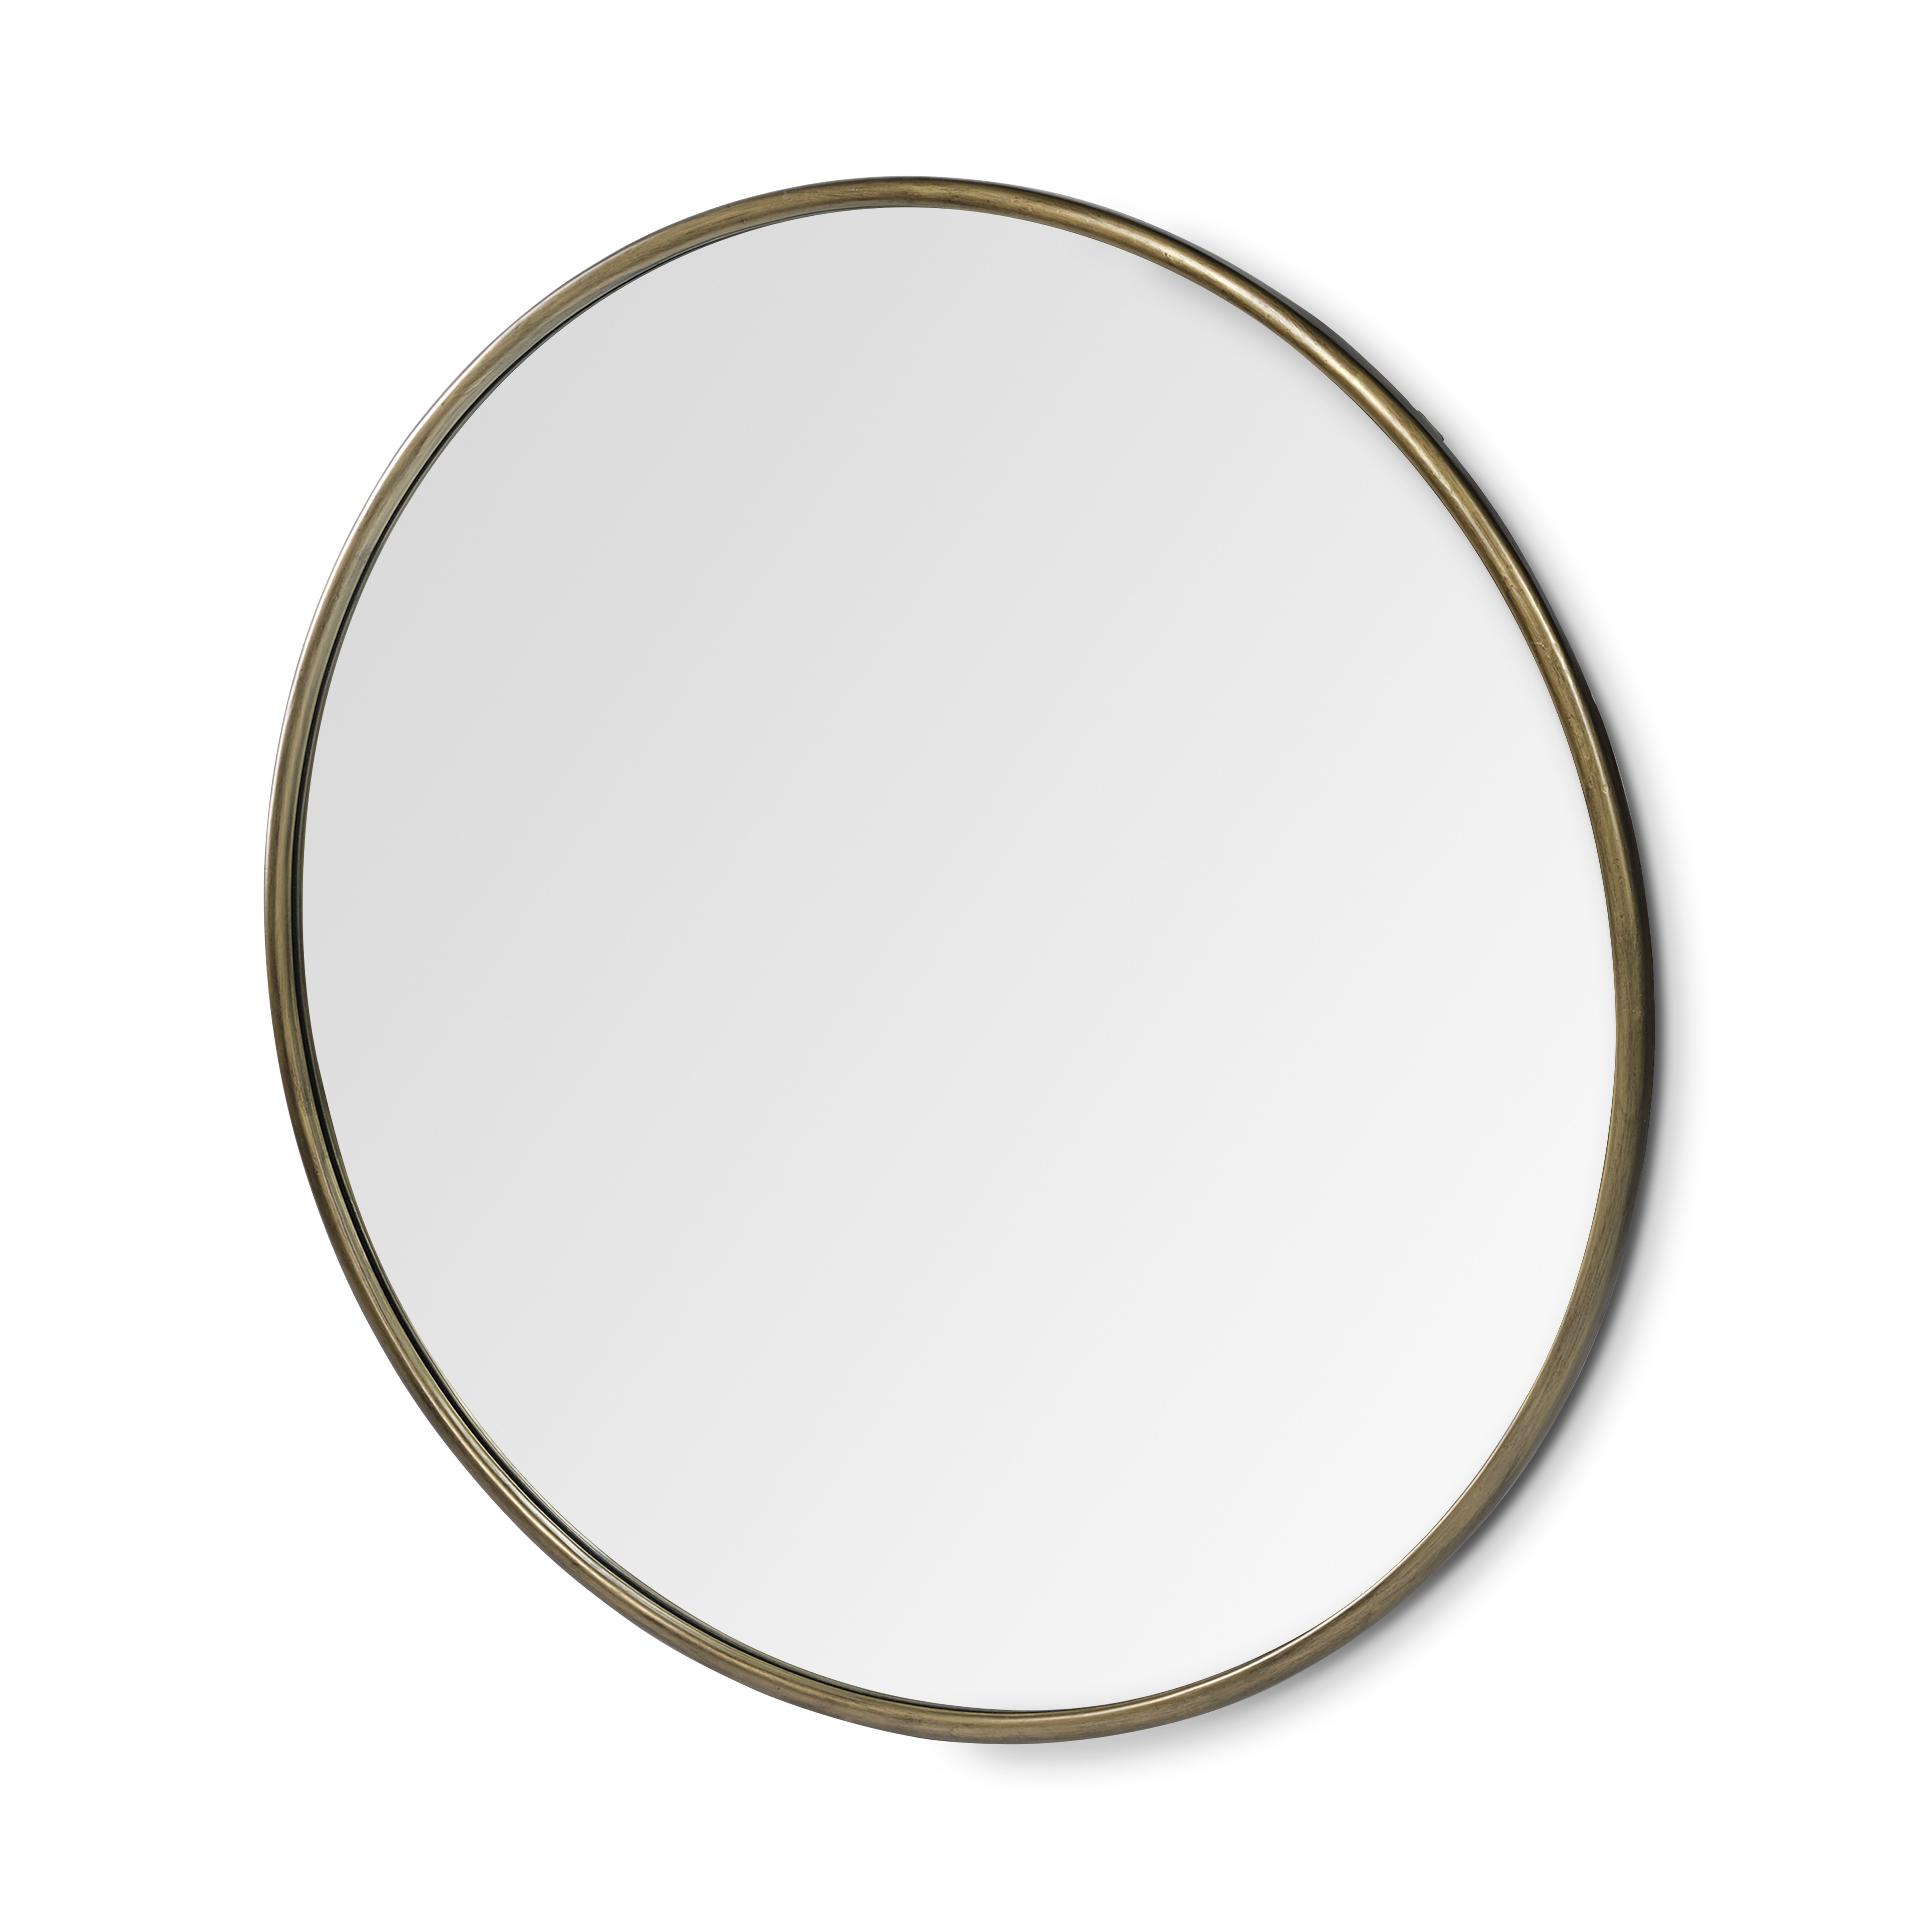 "47"" Round Gold Metal Frame Wall Mirror"